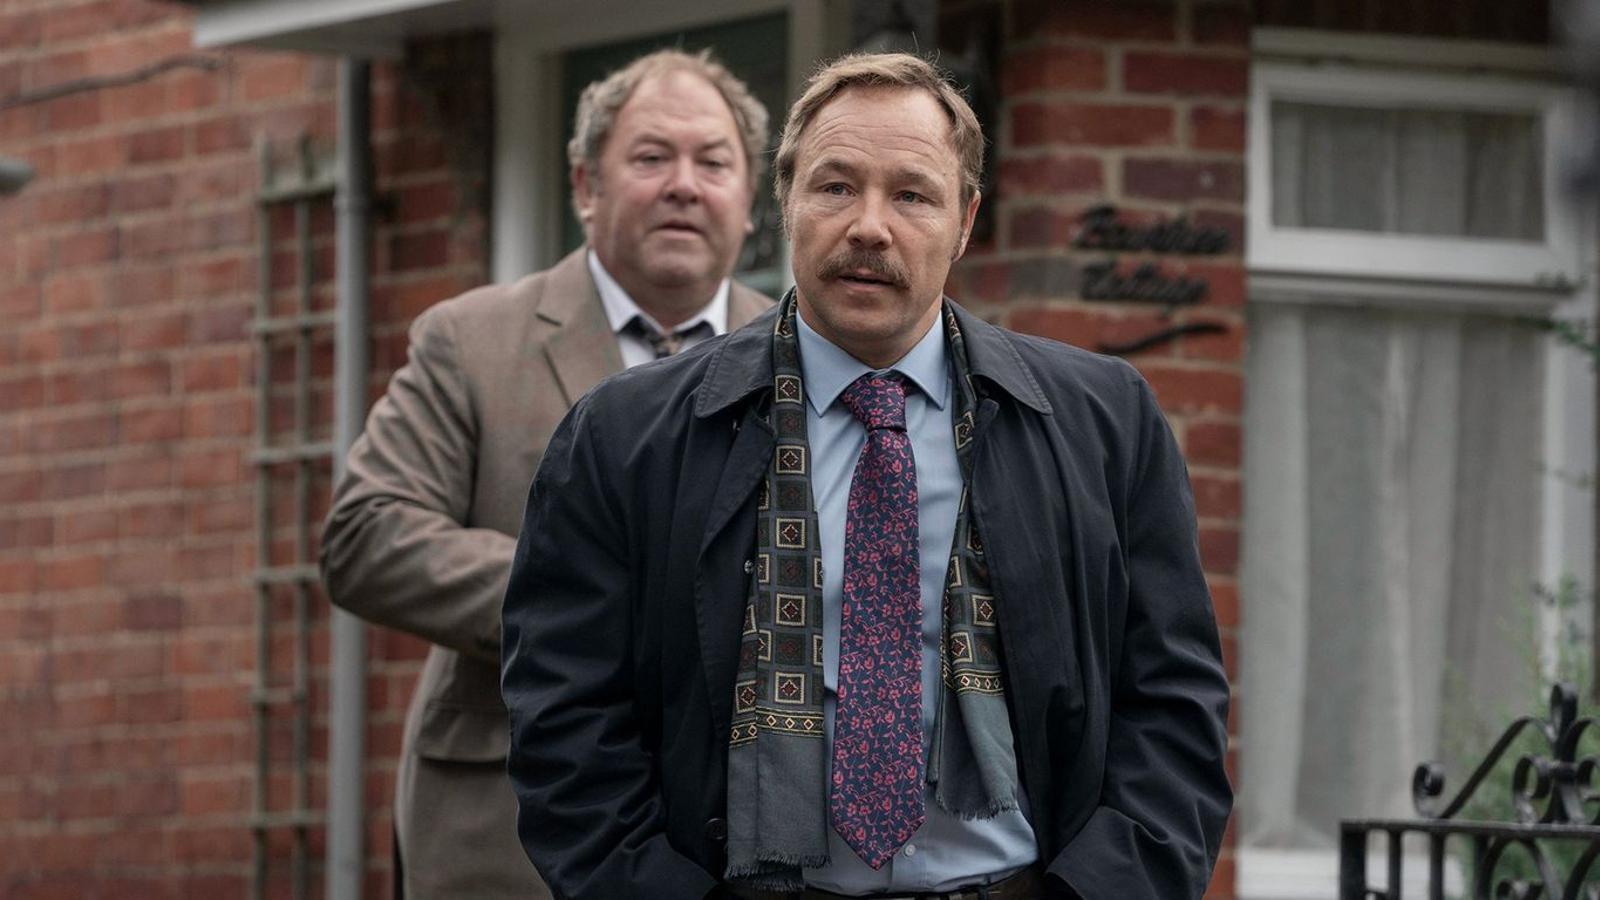 Els actors Mark Addy i Stephen Graham a la sèrie 'White House Farm'